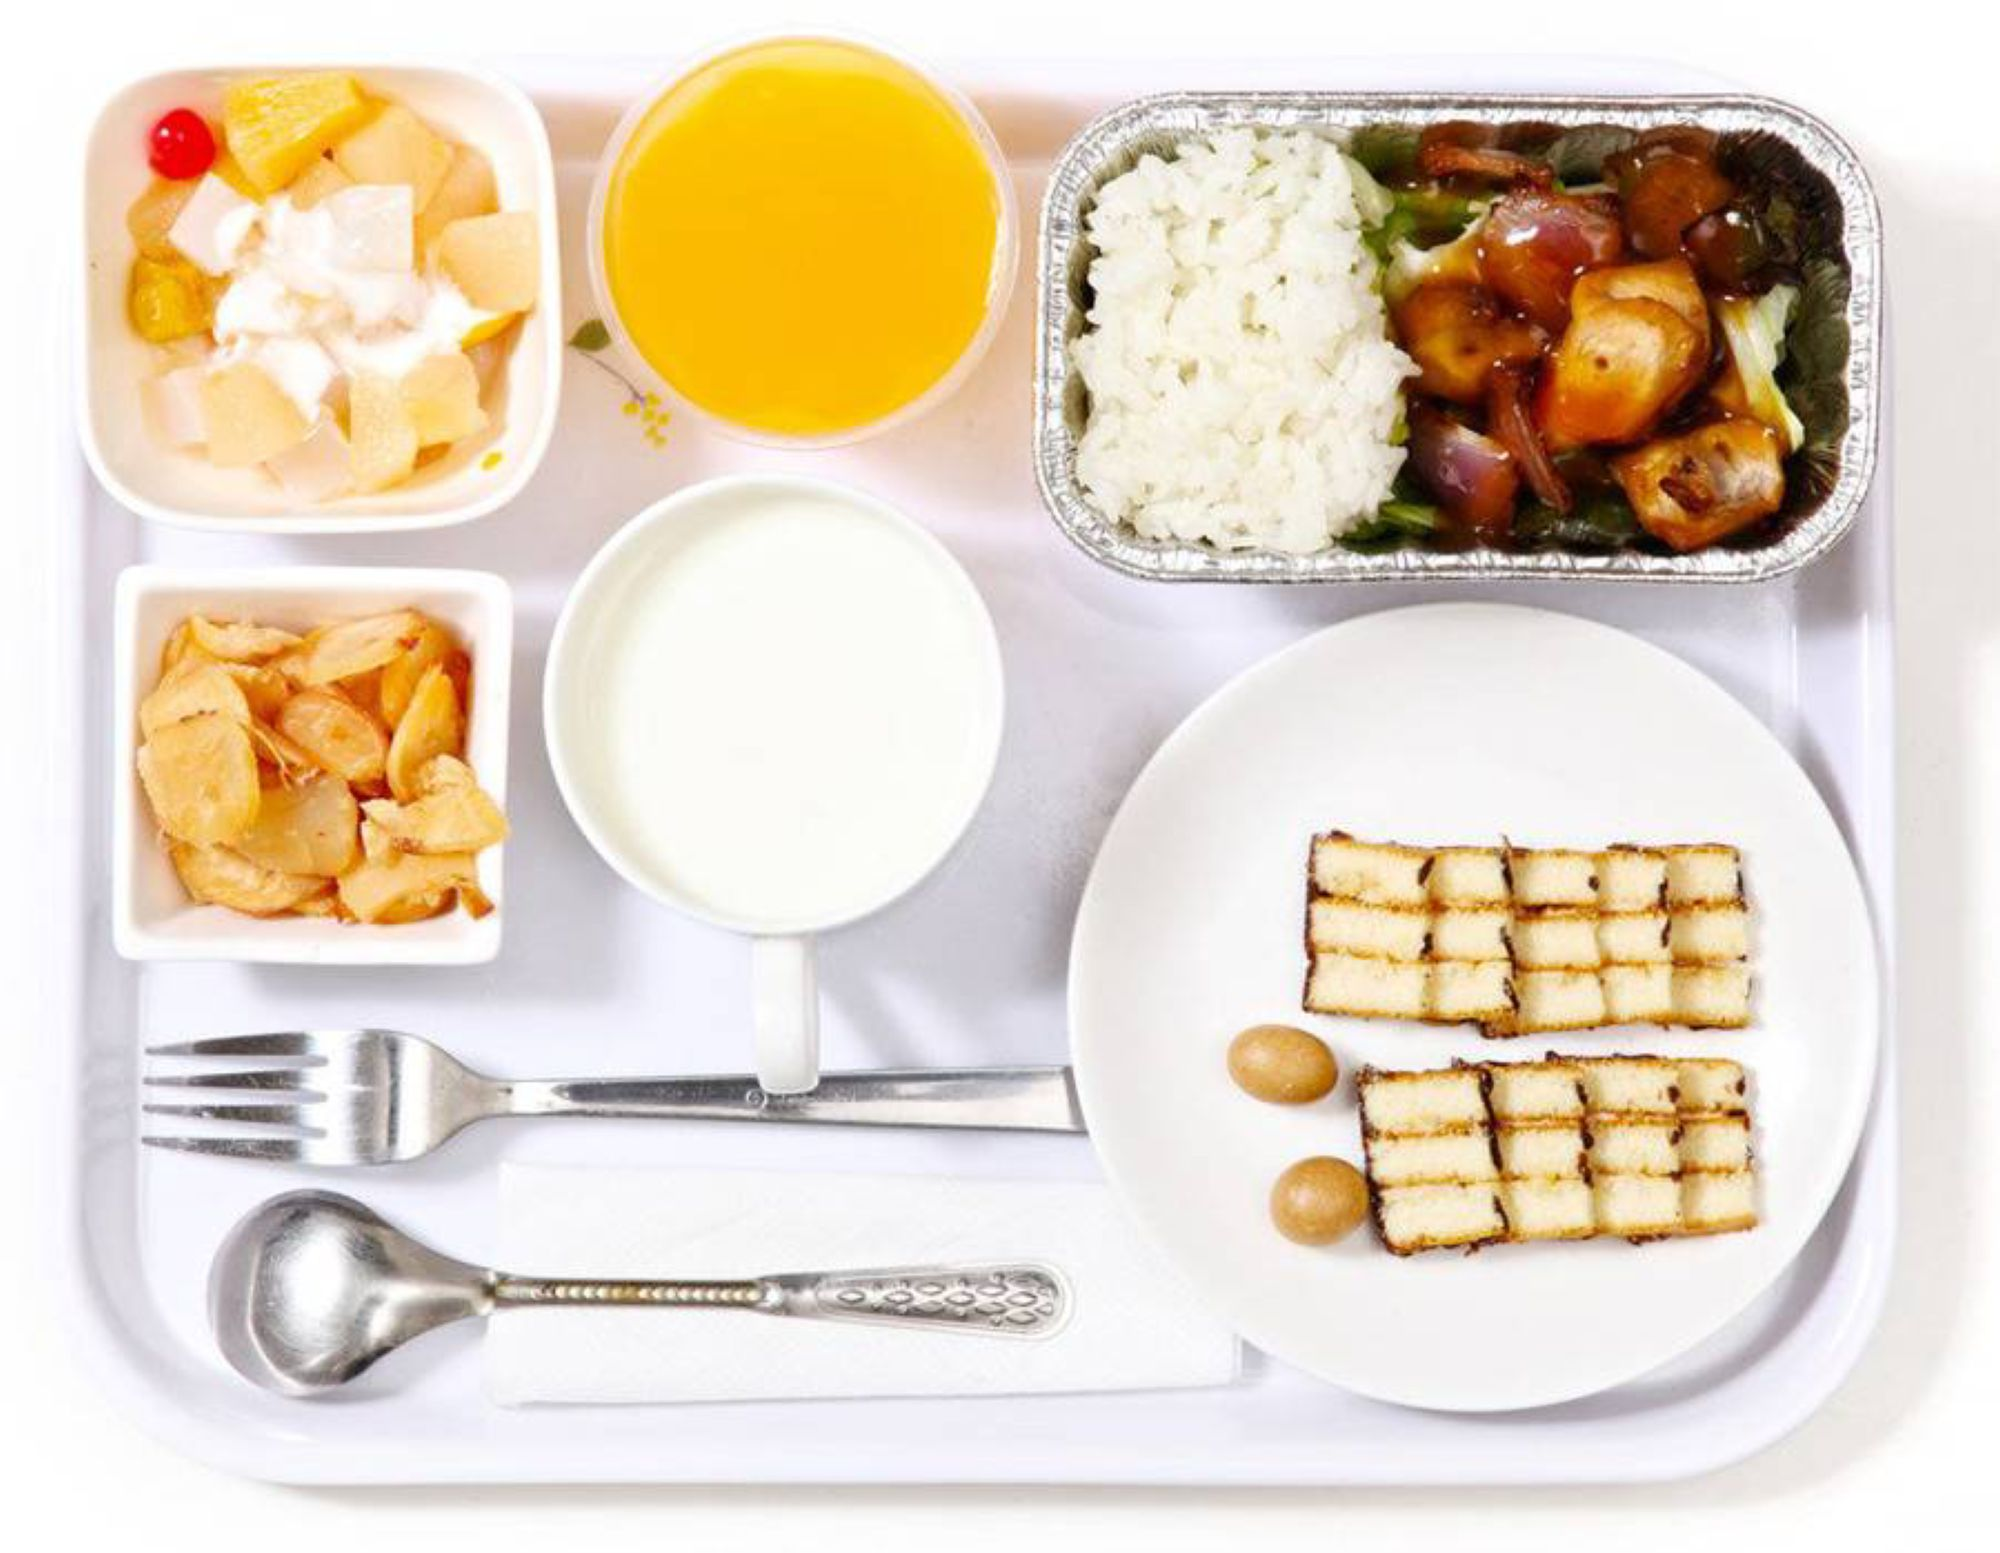 CN_20180625_Food_solution_Air_meals-01.jpg